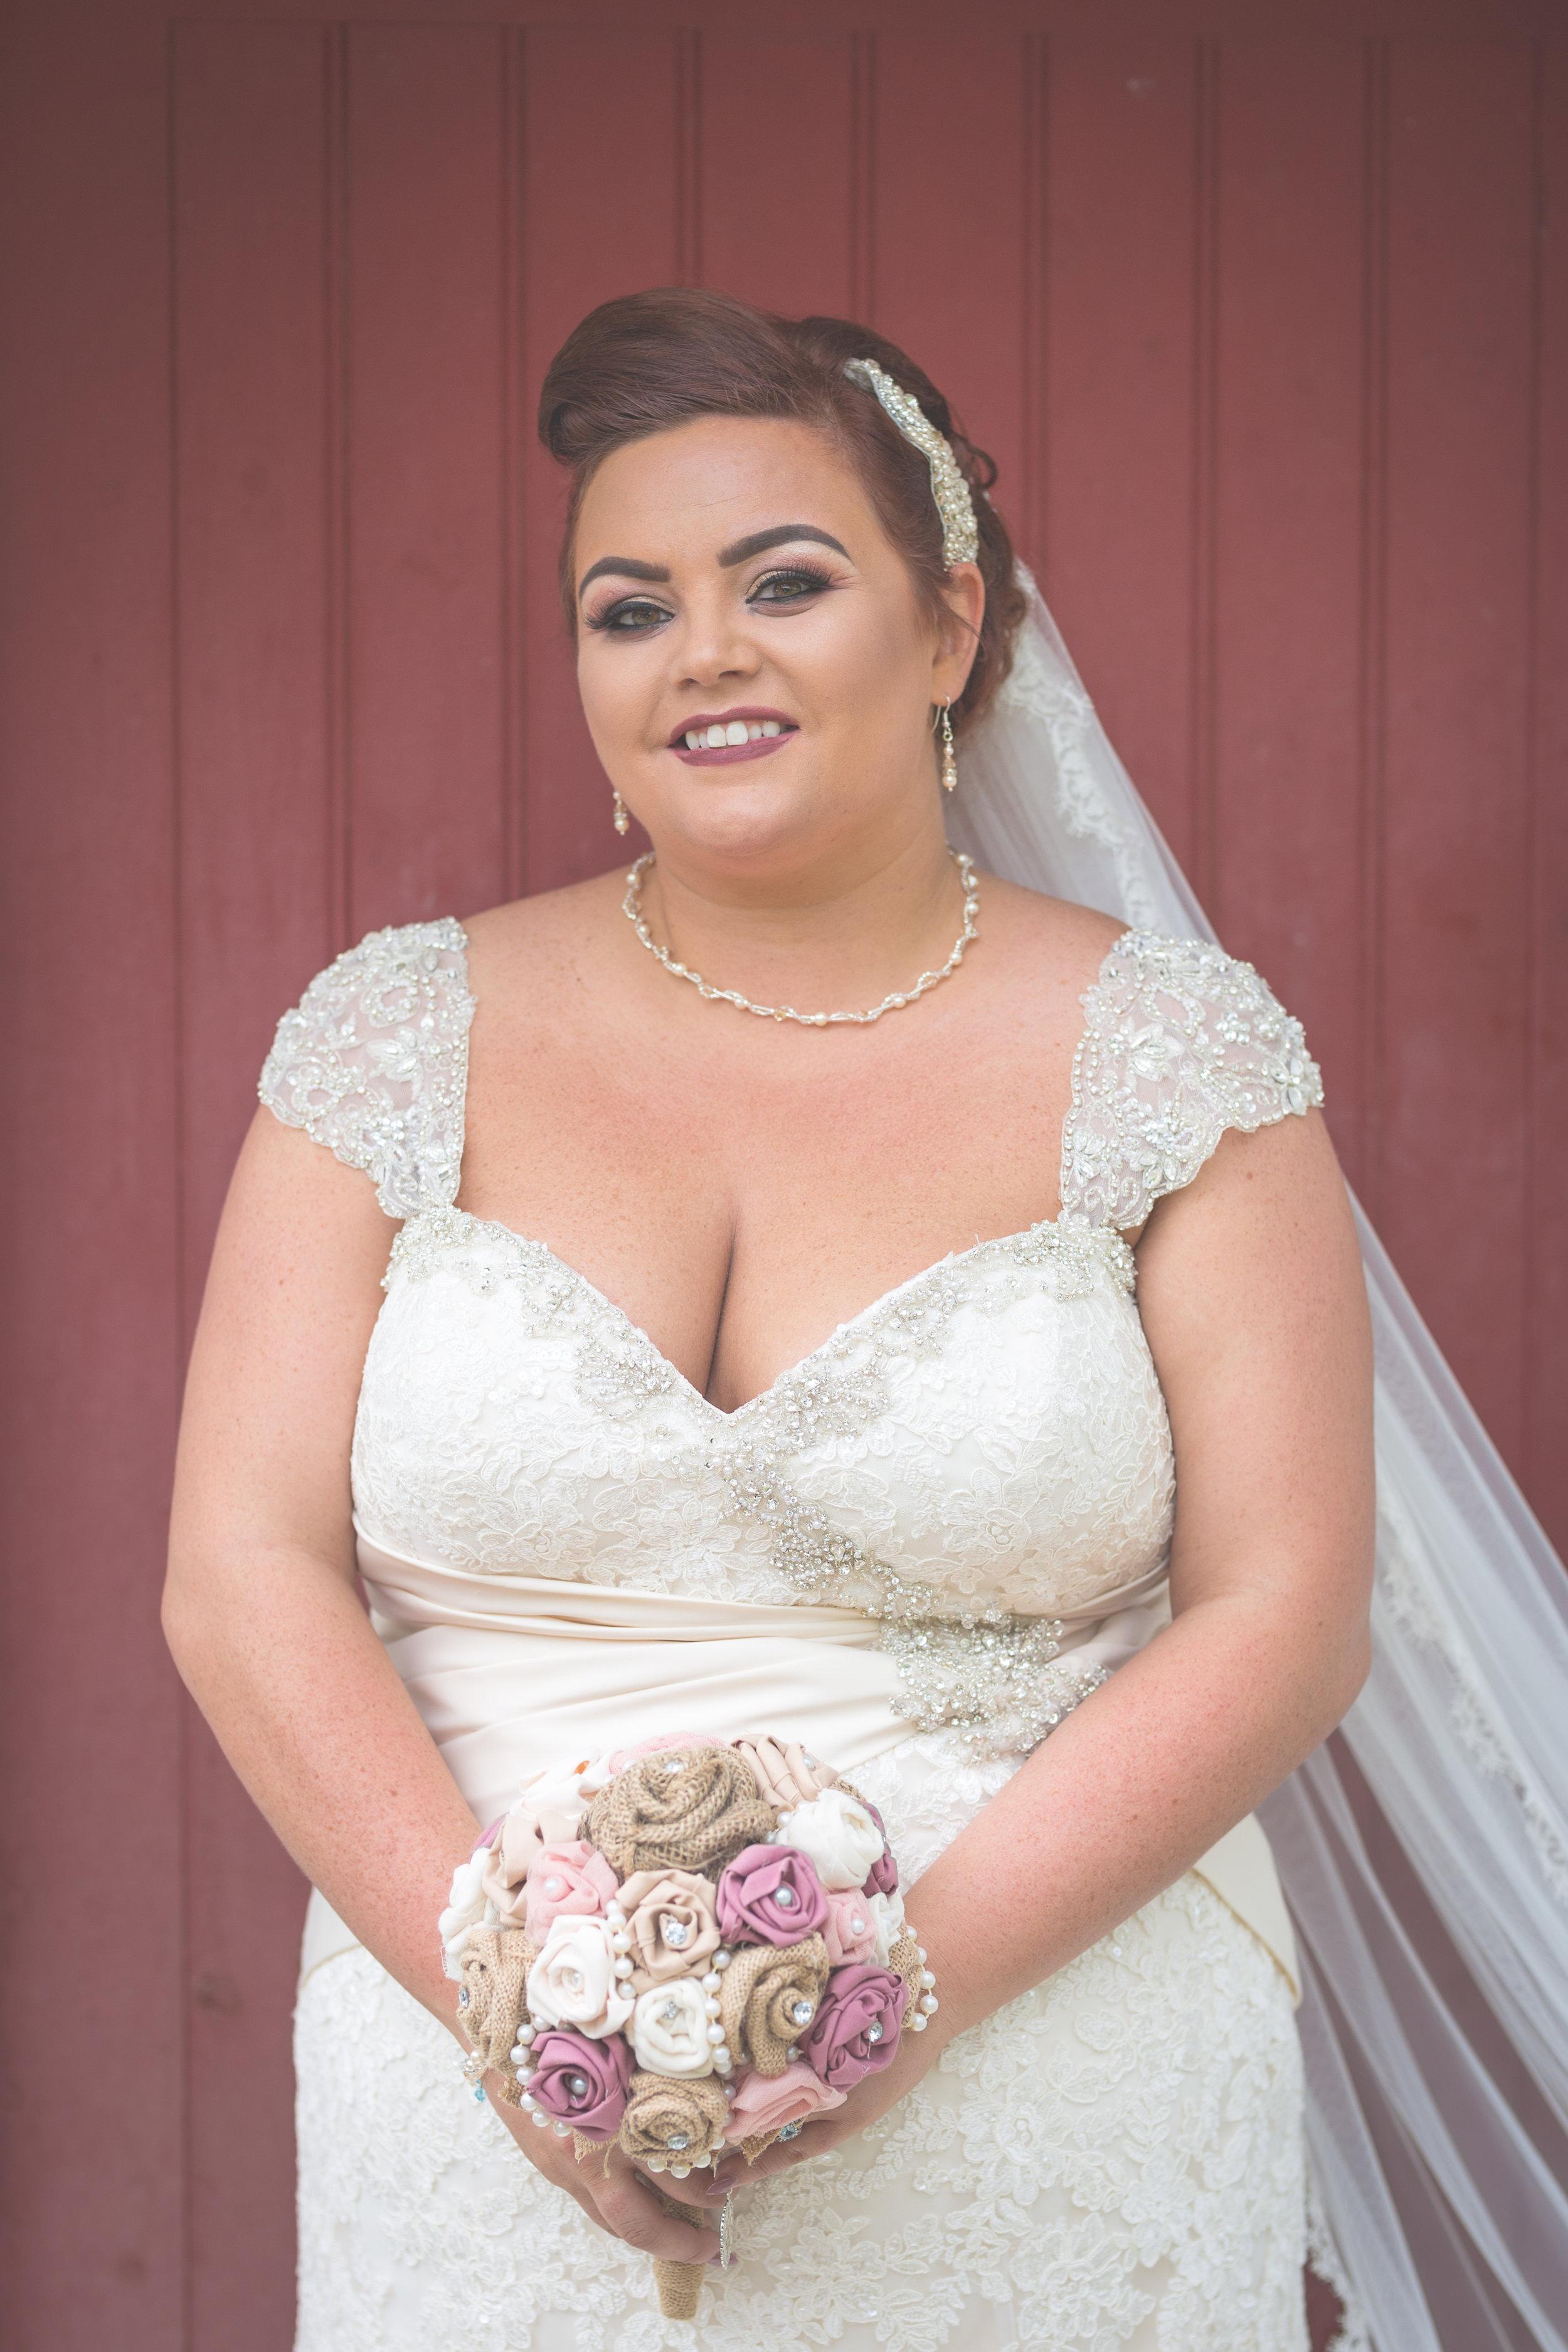 Antoinette & Stephen - Portraits   Brian McEwan Photography   Wedding Photographer Northern Ireland 11.jpg